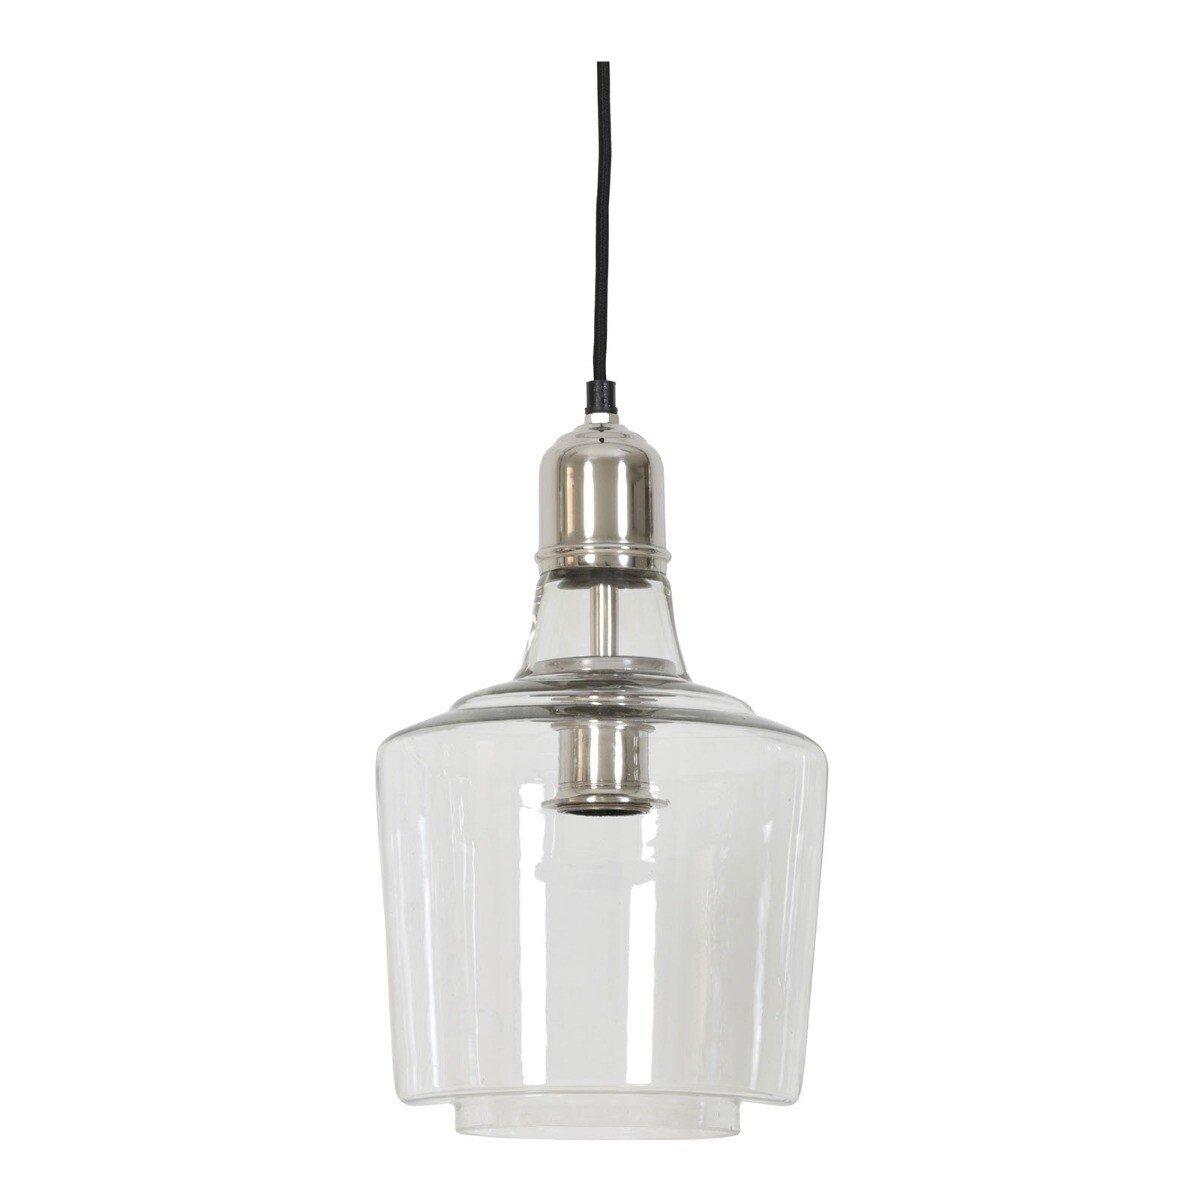 Hanglamp Ø21x34 cm YOLE glas nikkel Light & Living